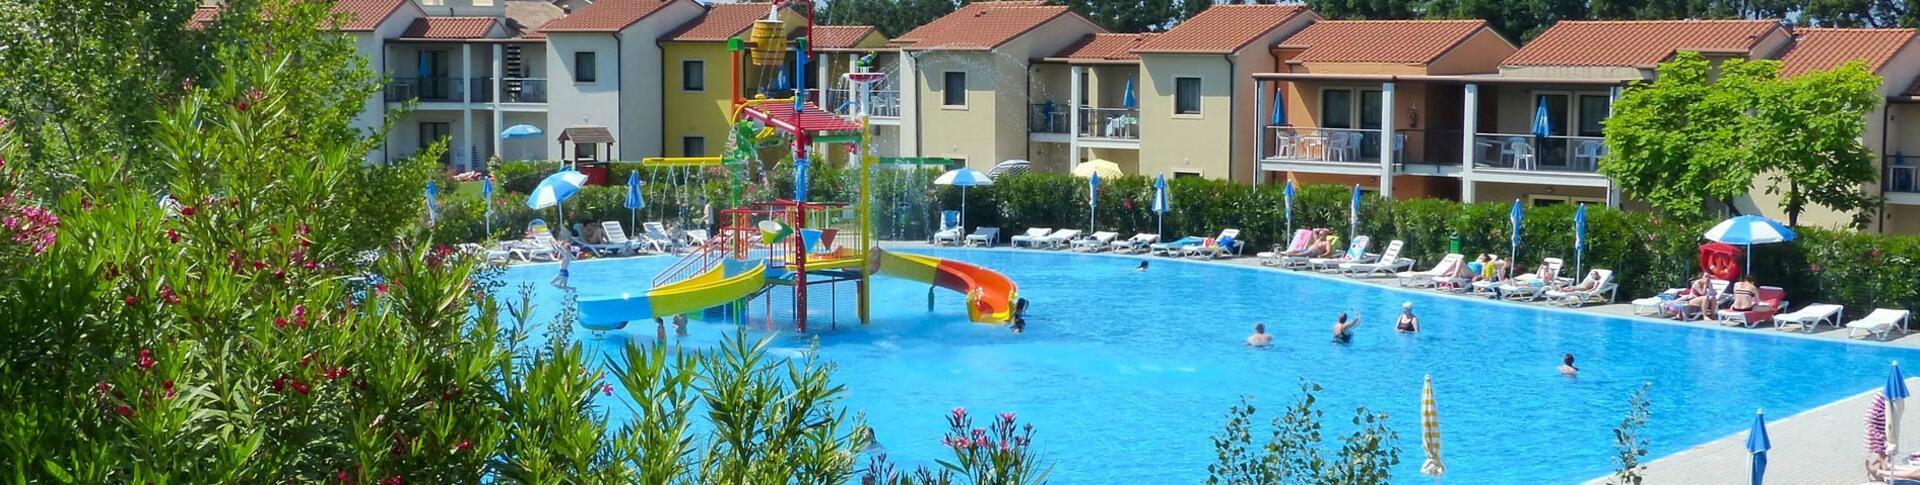 belvederevillage de pool-belvedere-village 003